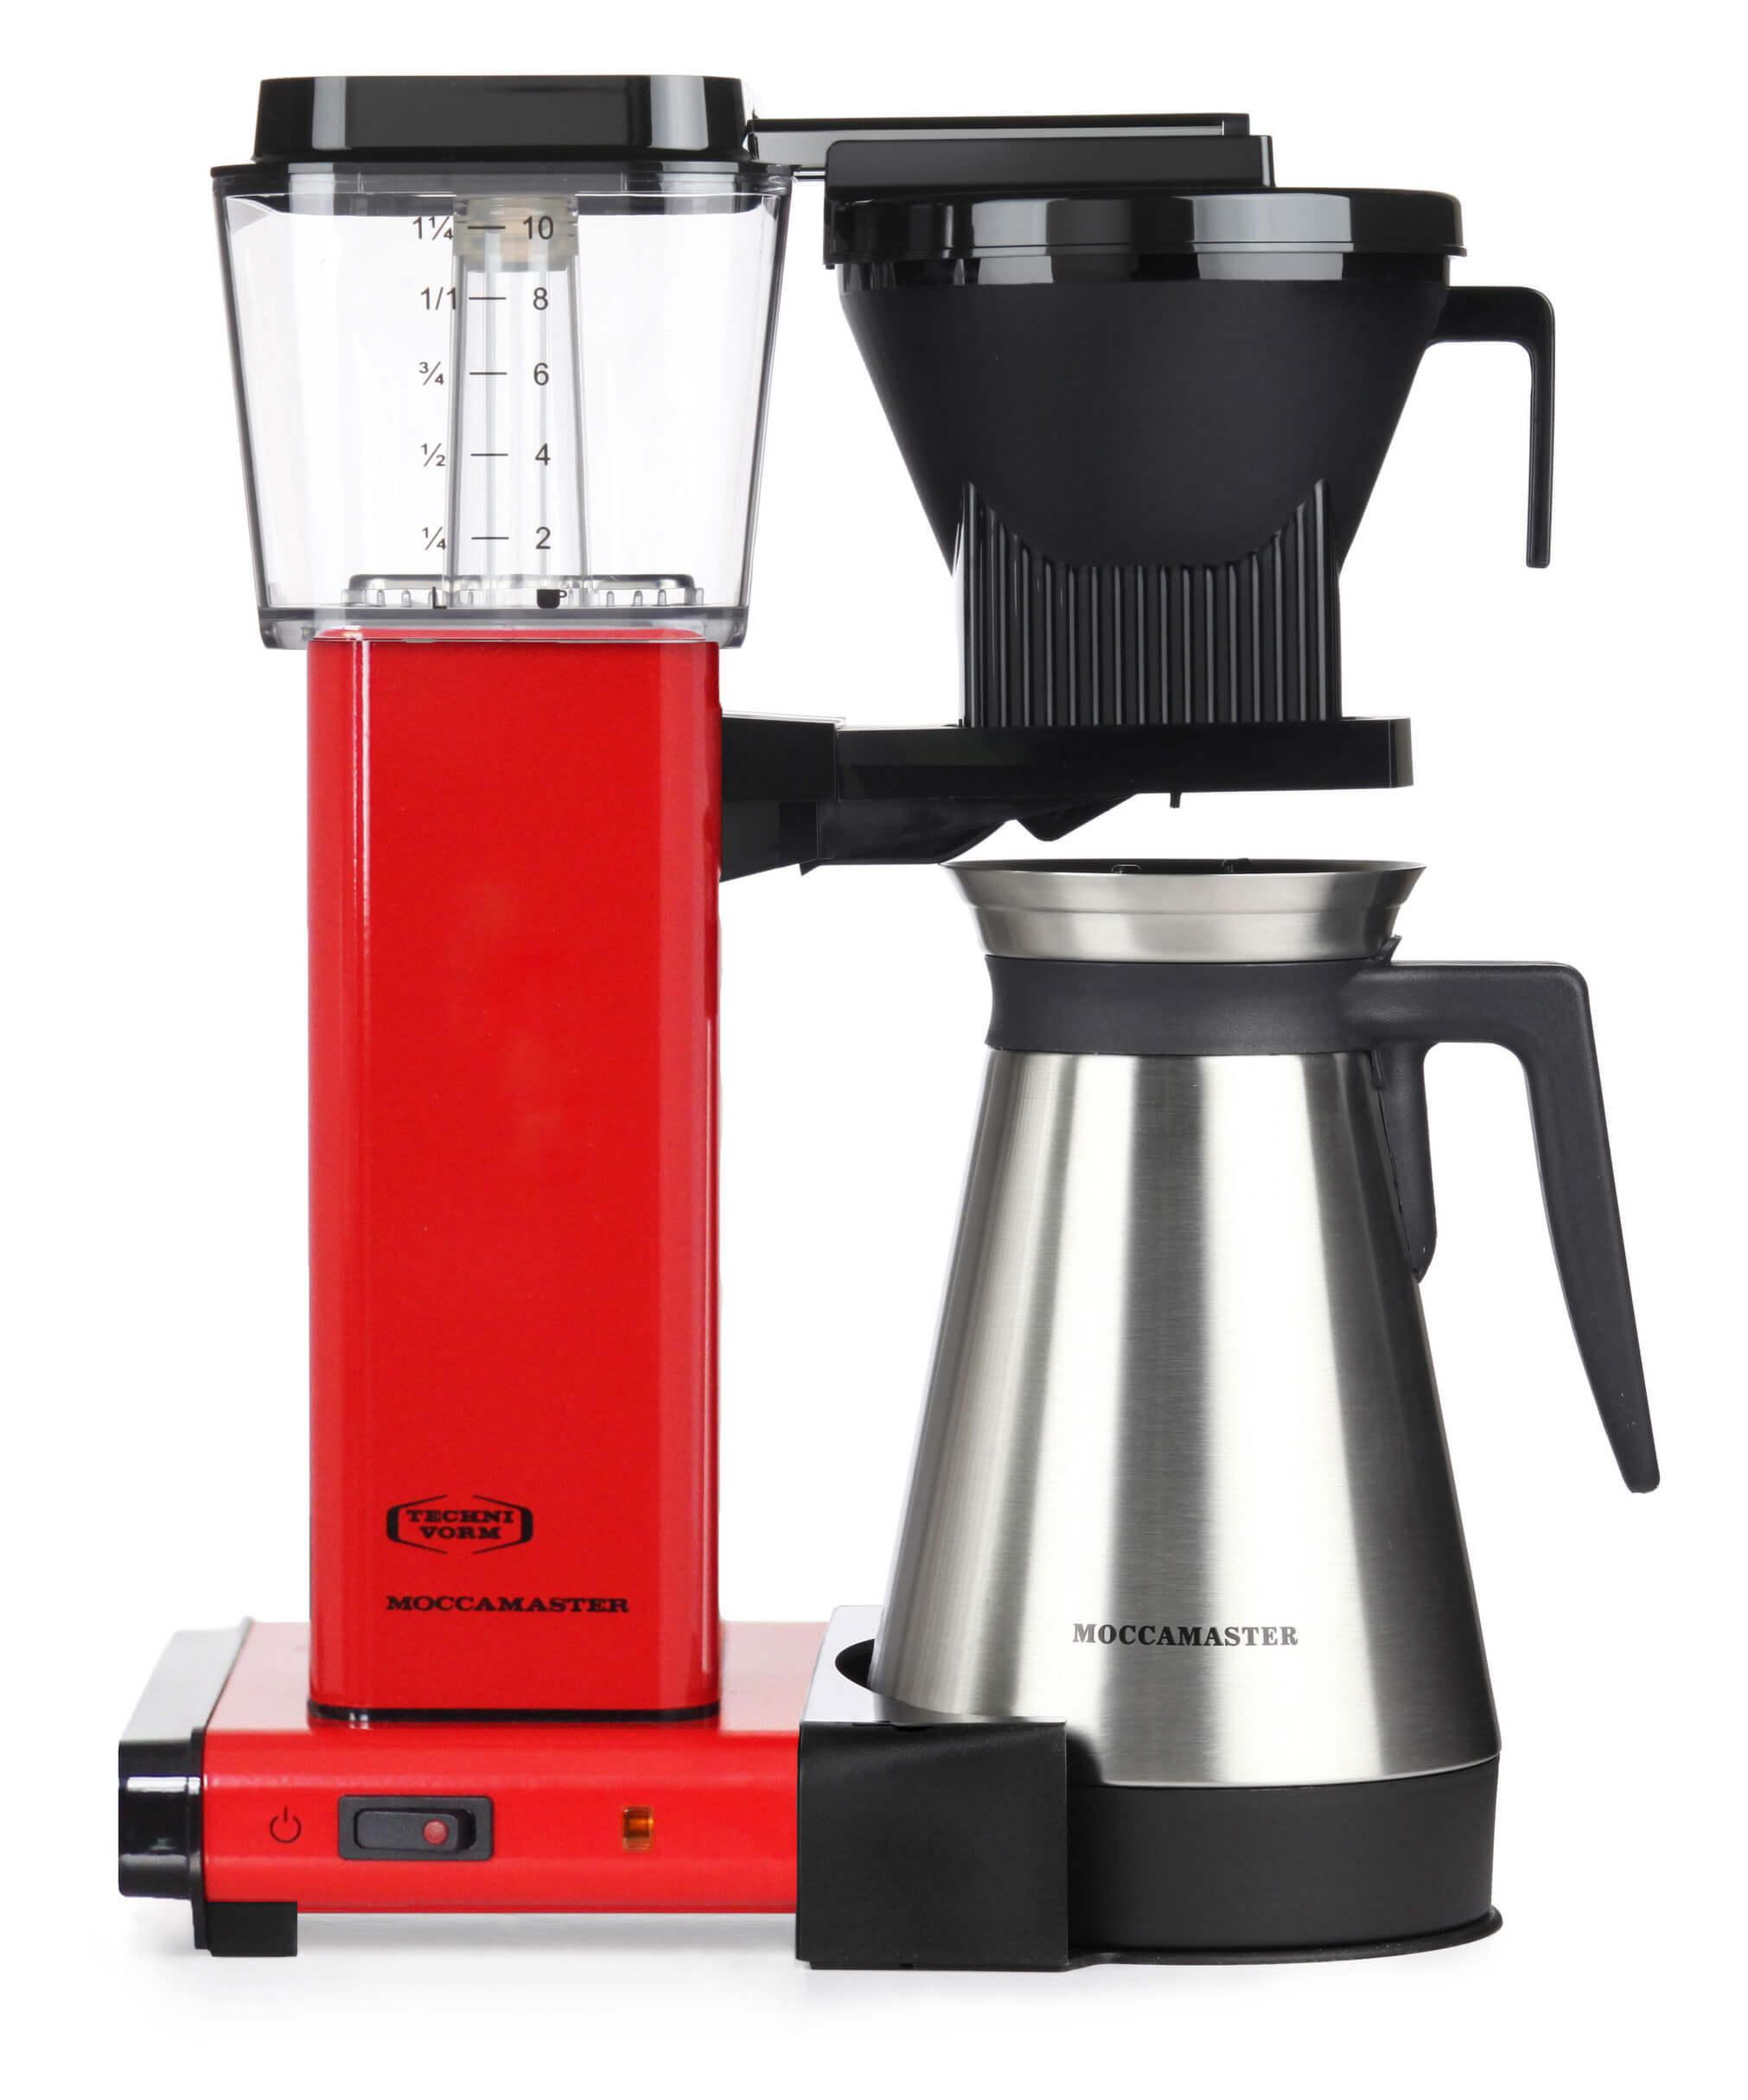 Moccamaster Kaffeeautomat KBGT 741 Thermo Red | Kamasega